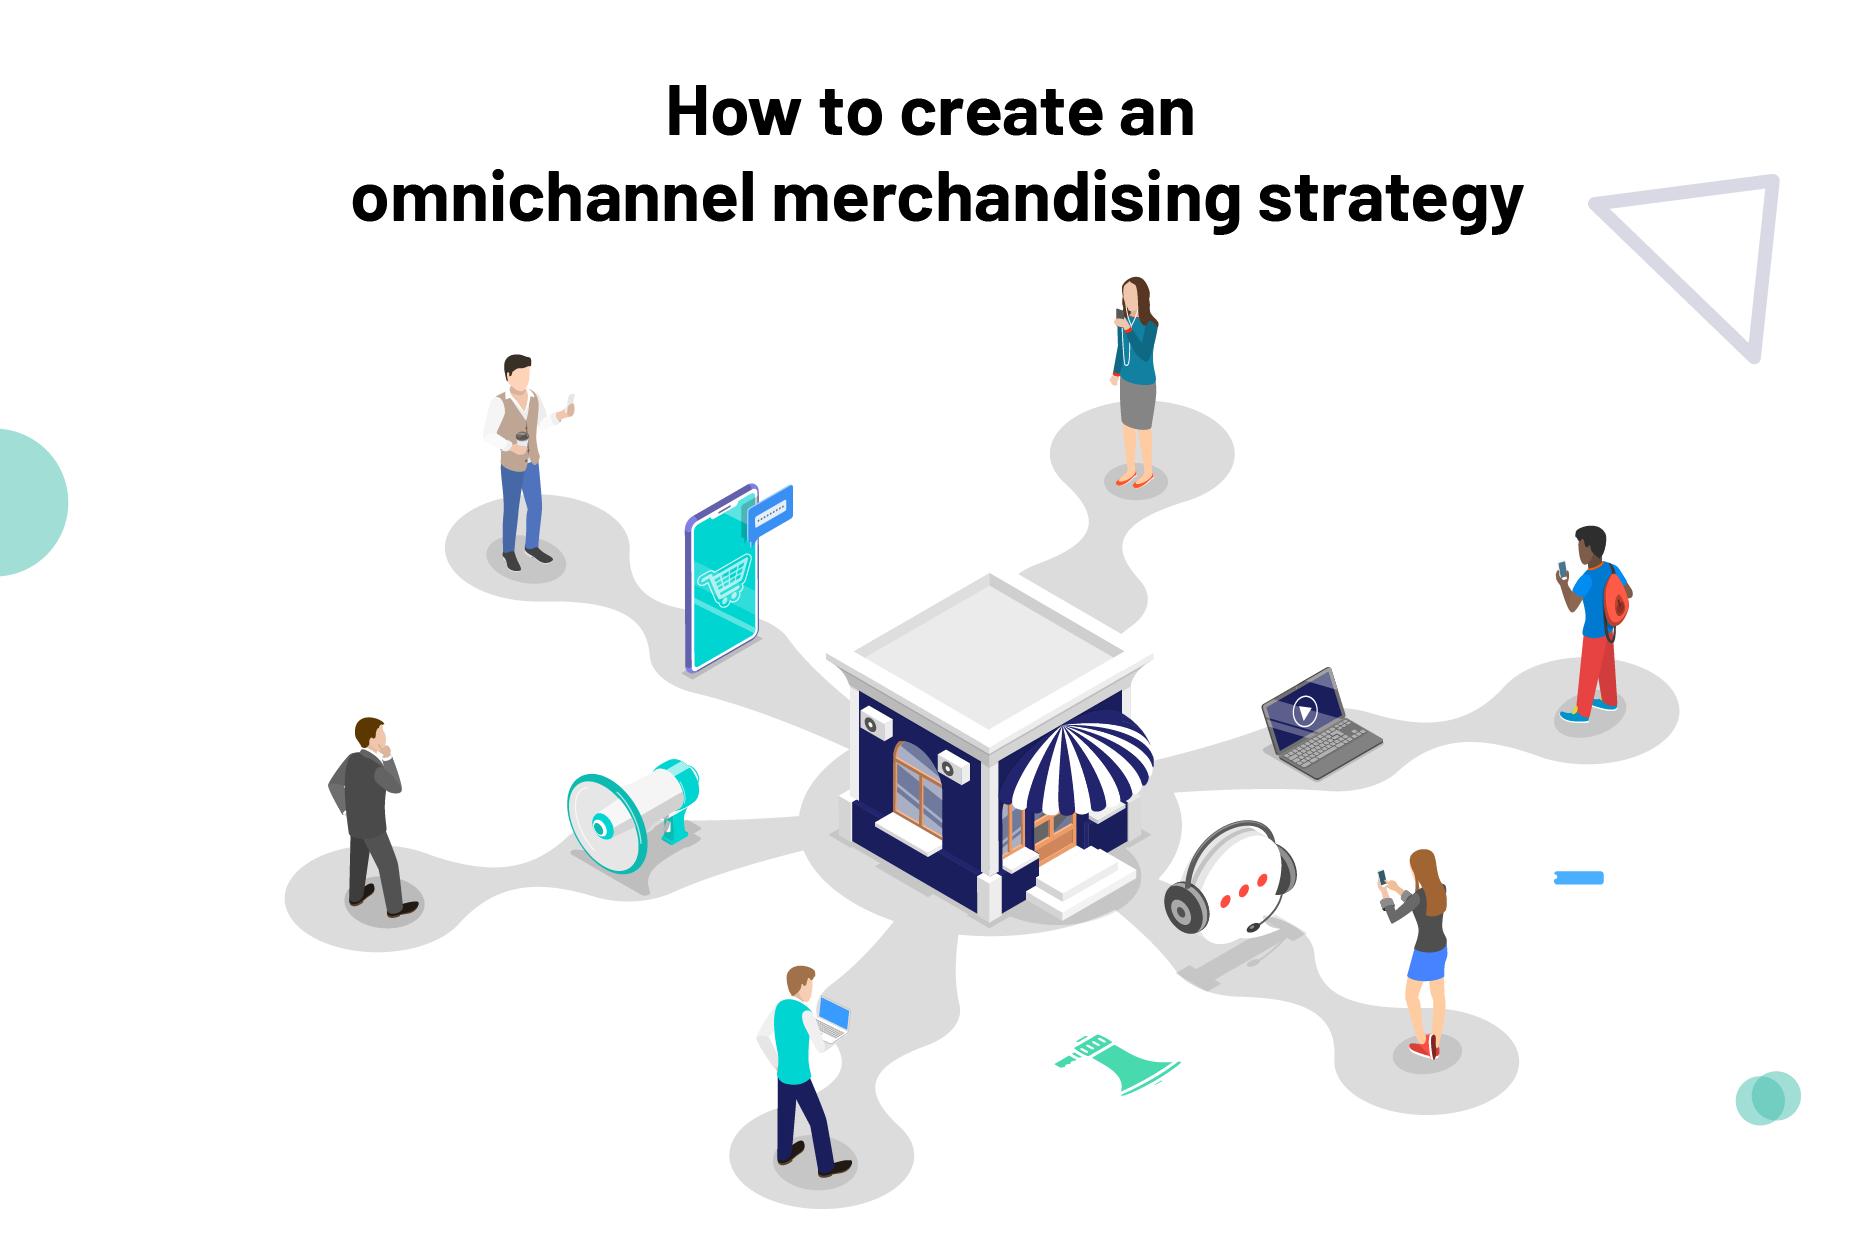 Omnichannel merchandising strategy